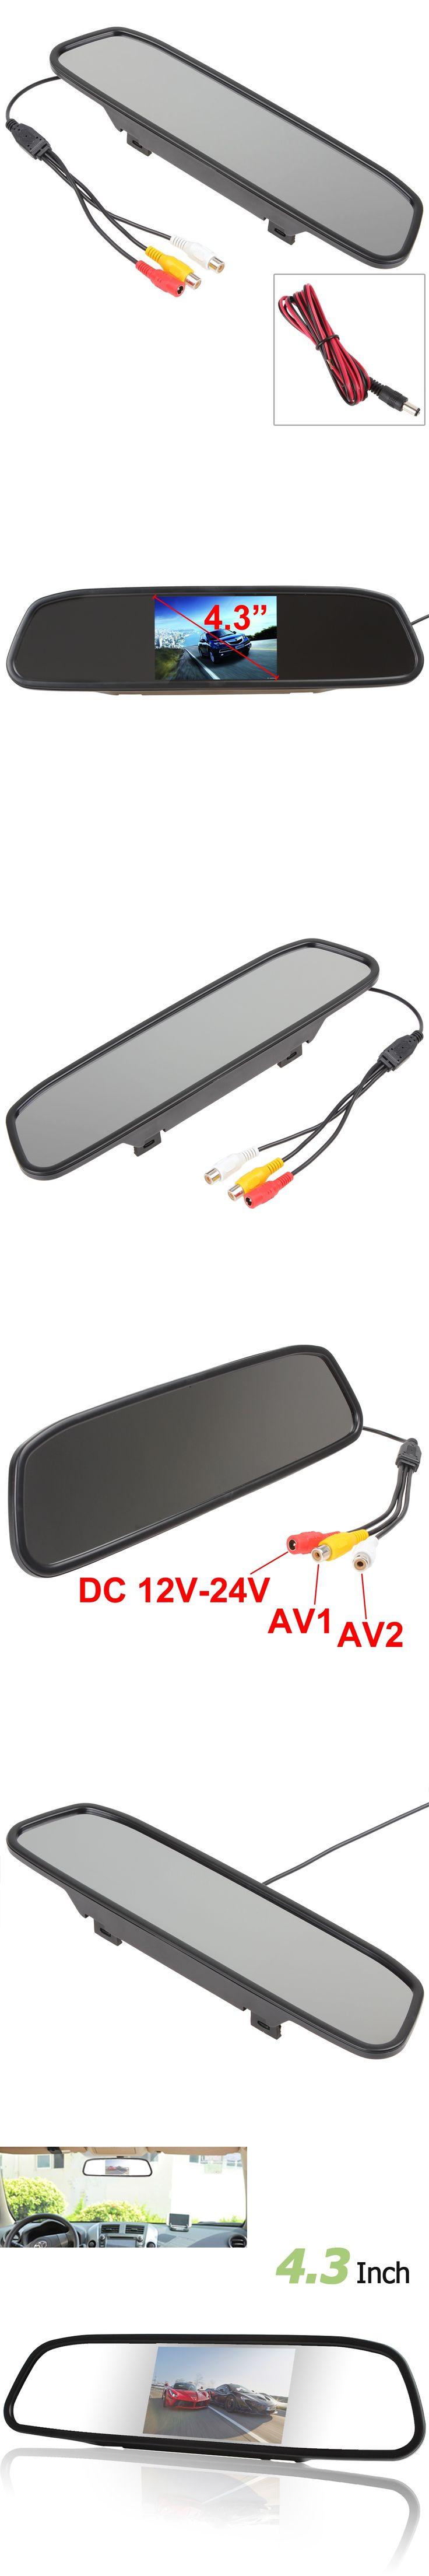 CAR HORIZON Car Mirror Monitor 4.3 inch Color Digital TFT-LCD Screen Car Rear View Mirror Monitor 480x272 Car Monitor